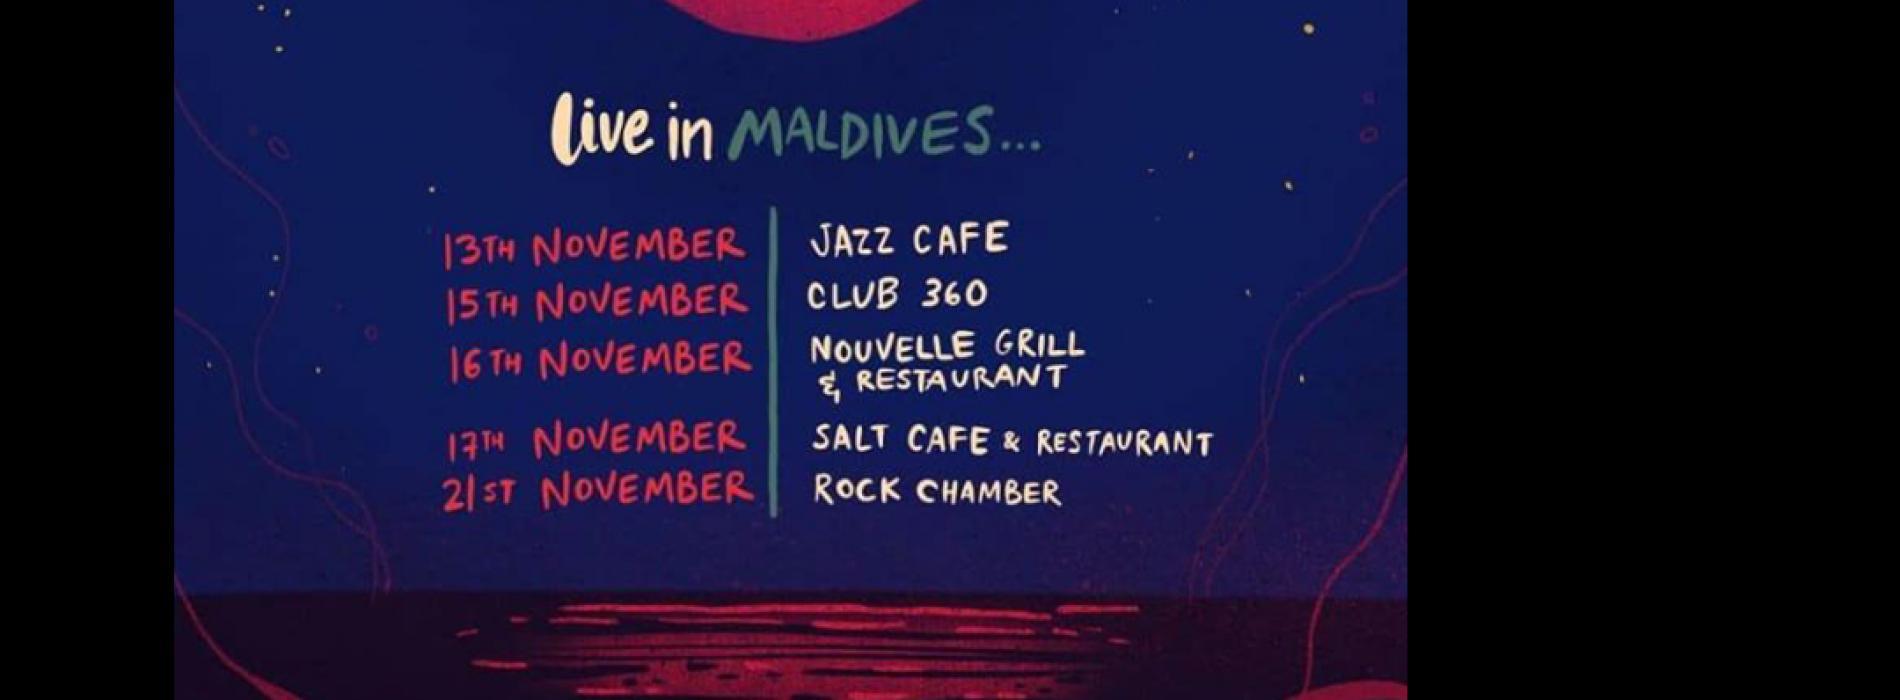 The Soul Tours The Maldives Soon!